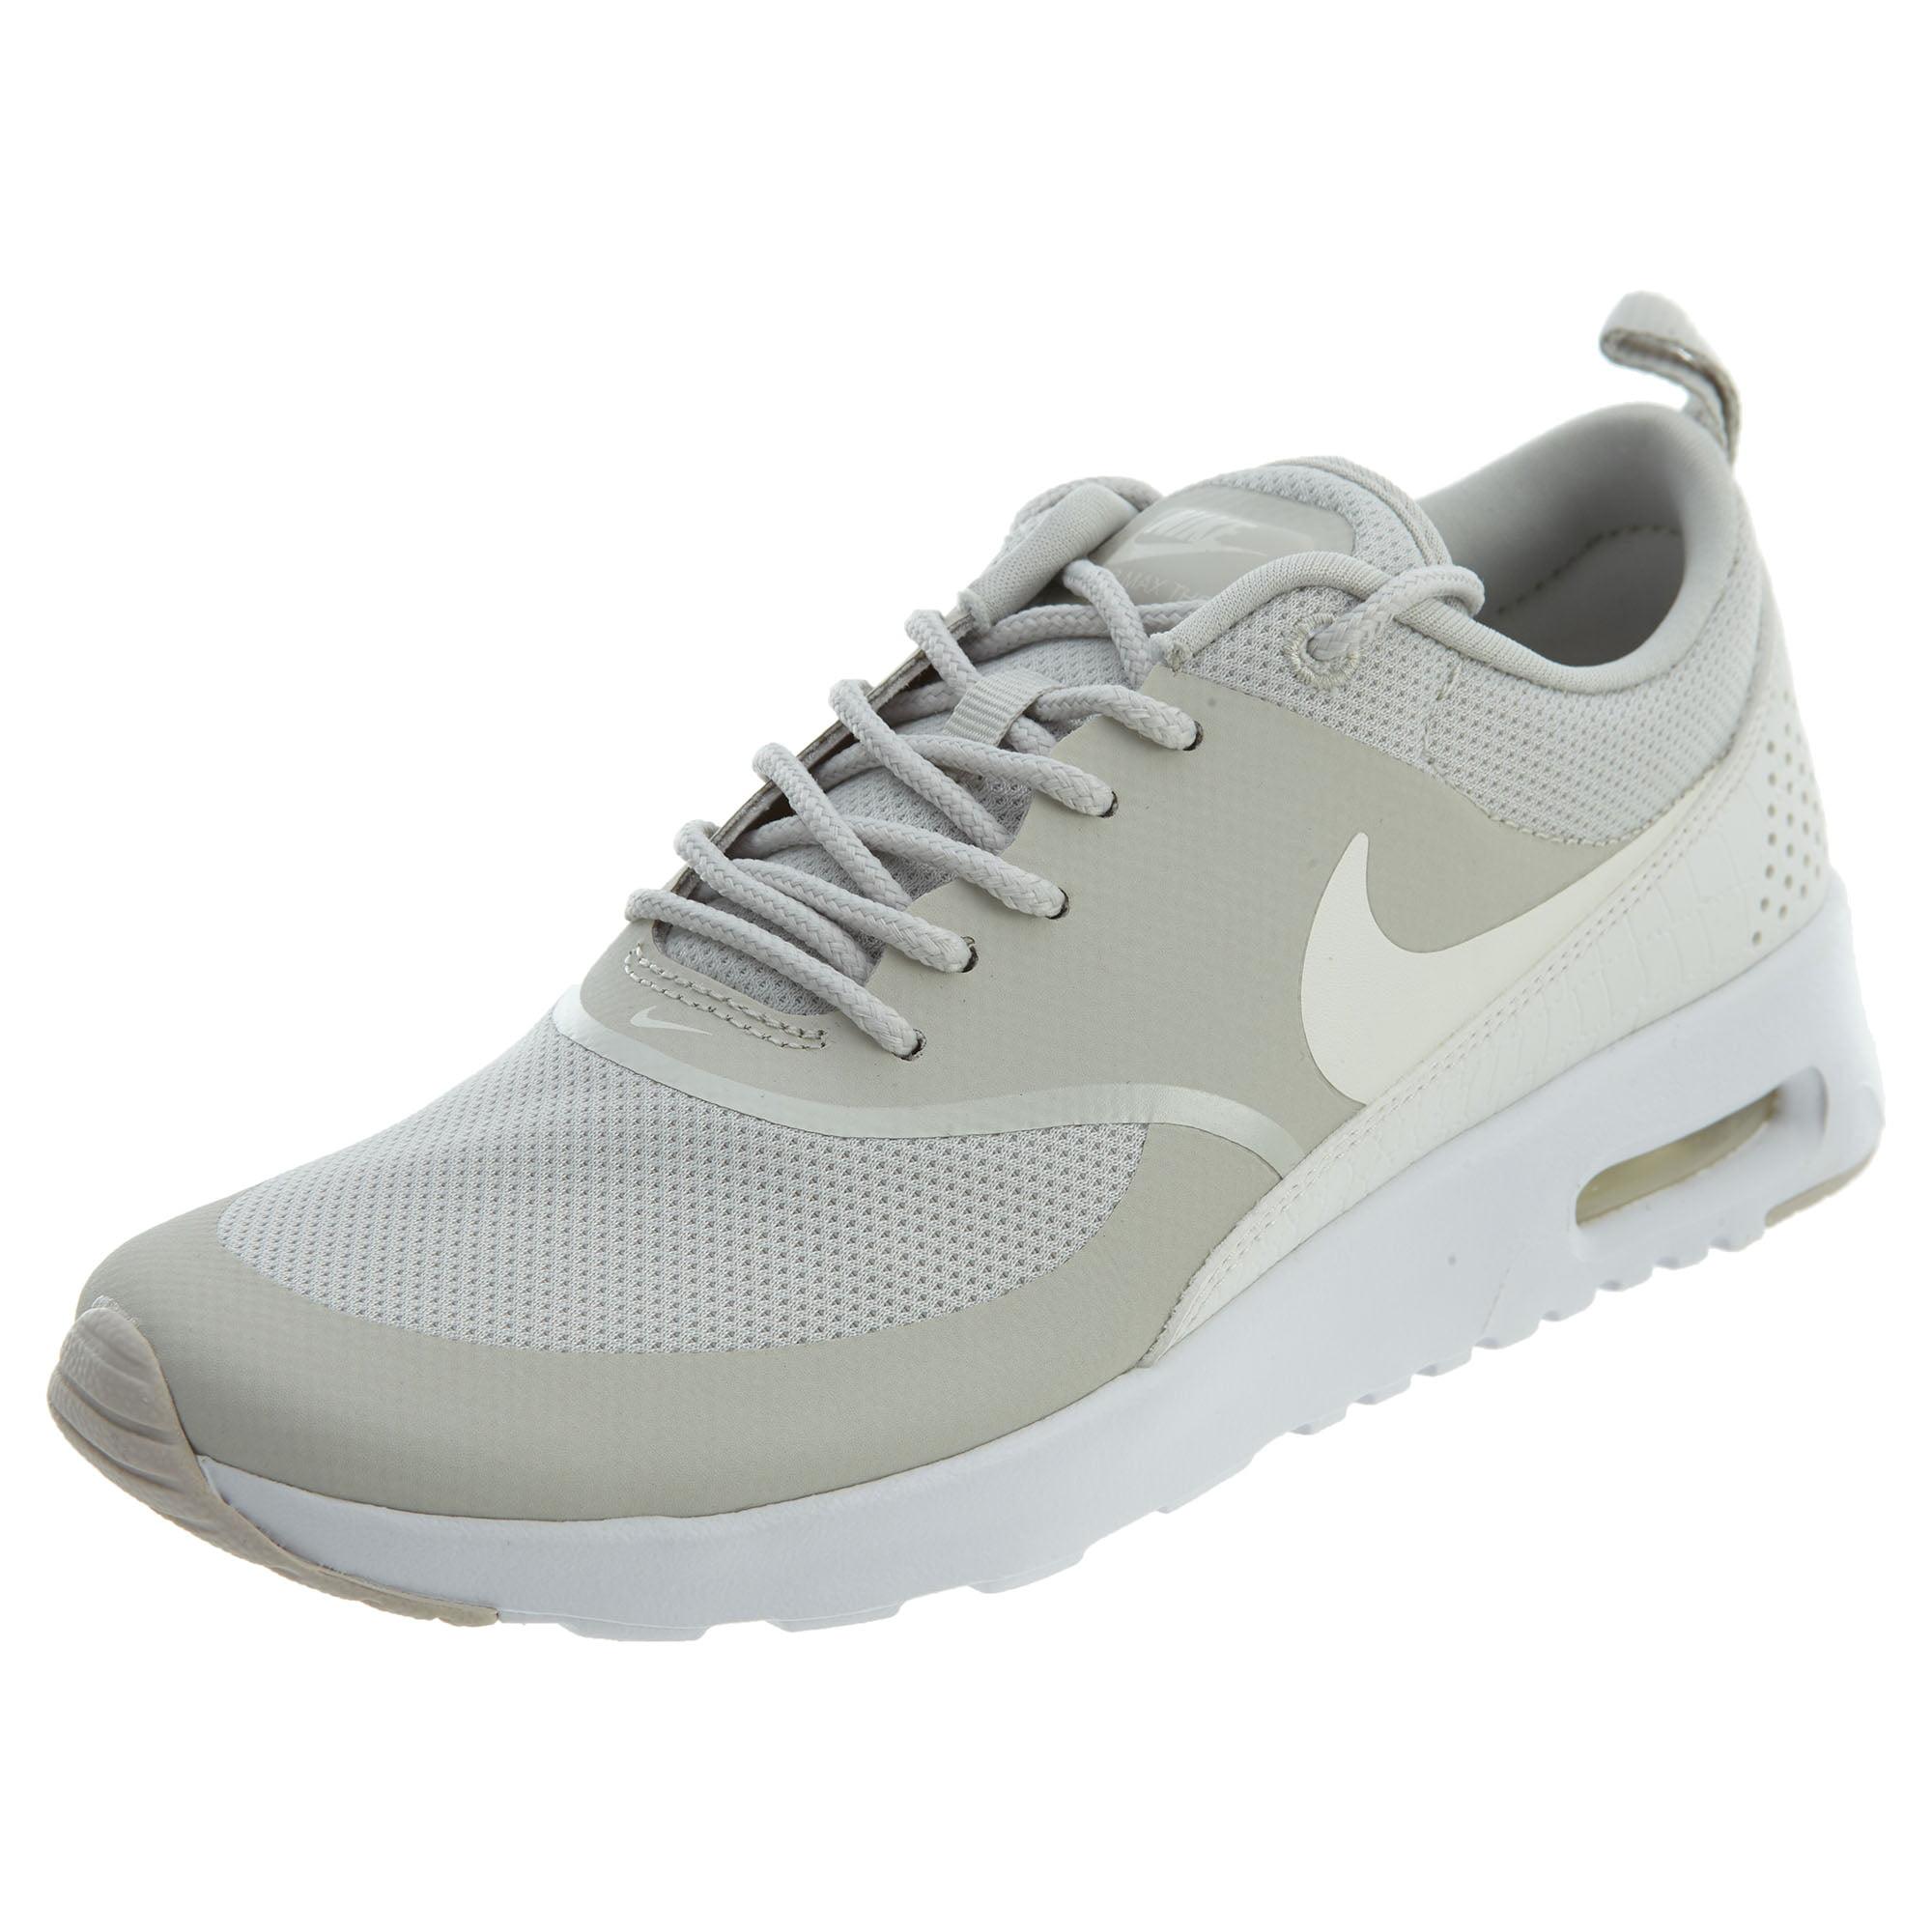 Nike Air Max Thea Womens Style : 599409